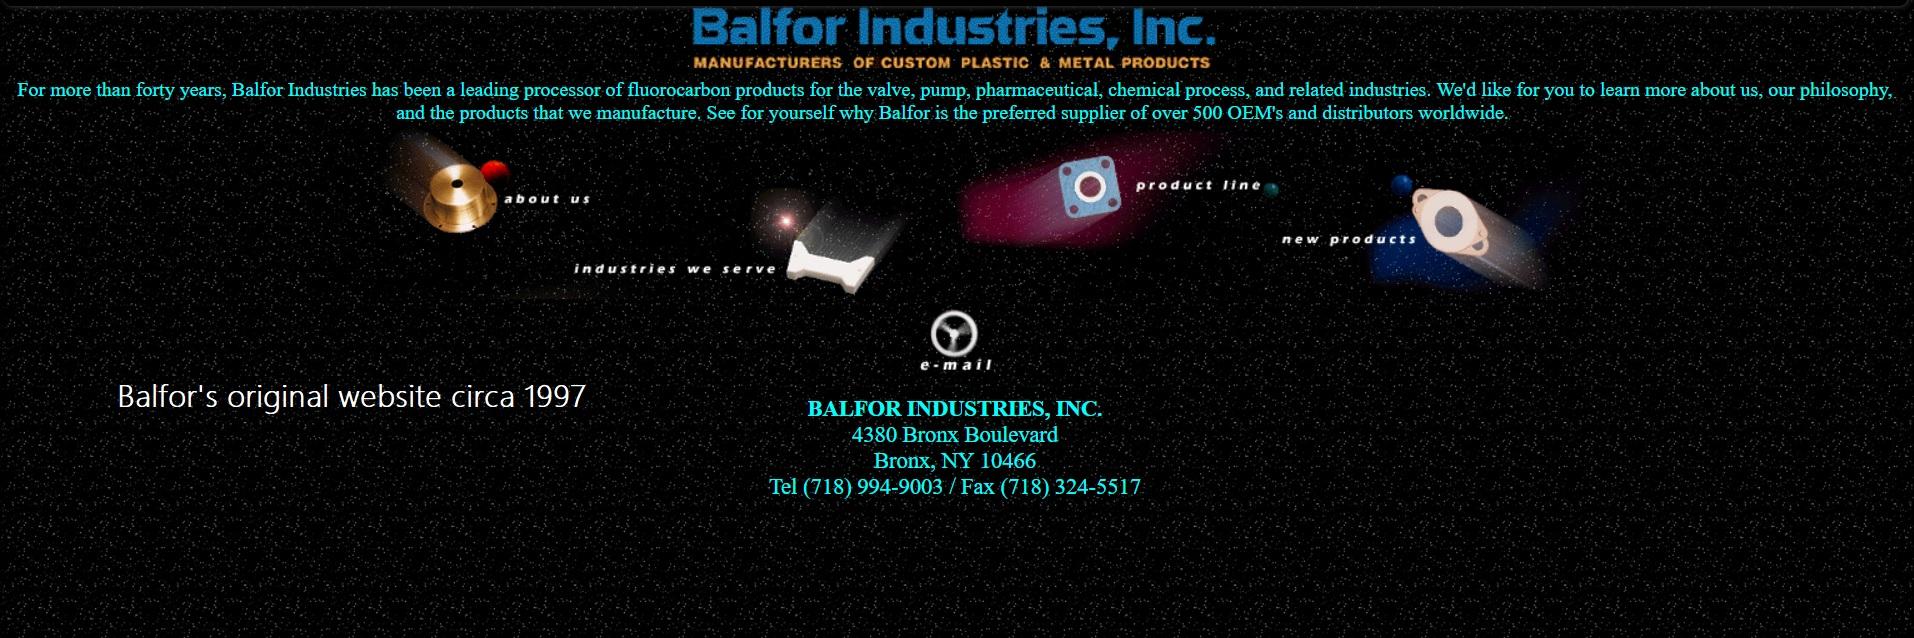 Balfor.com1997.jpg